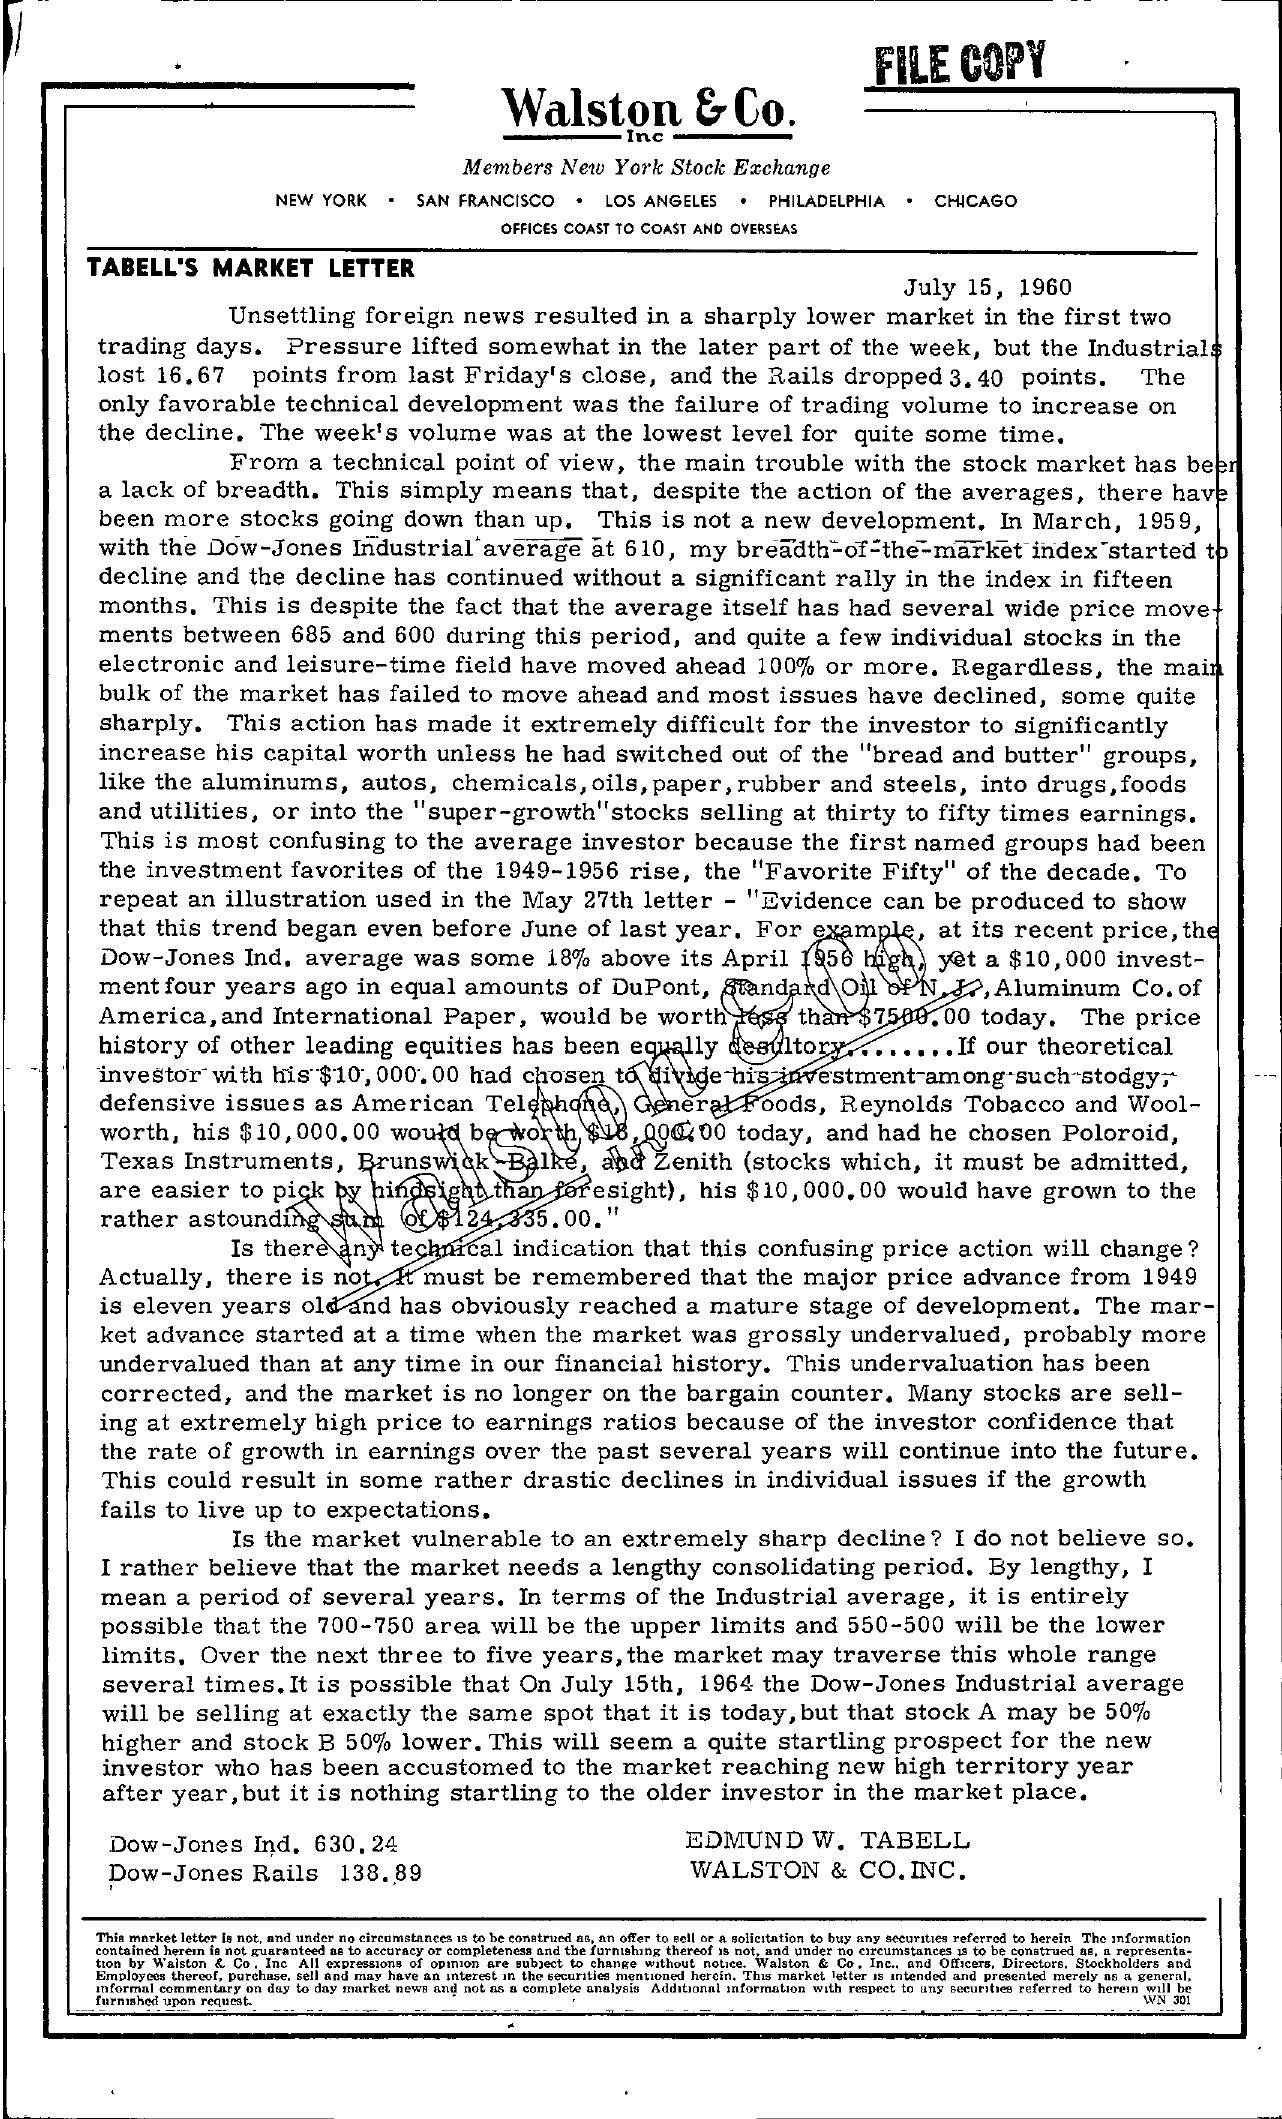 Tabell's Market Letter - July 15, 1960